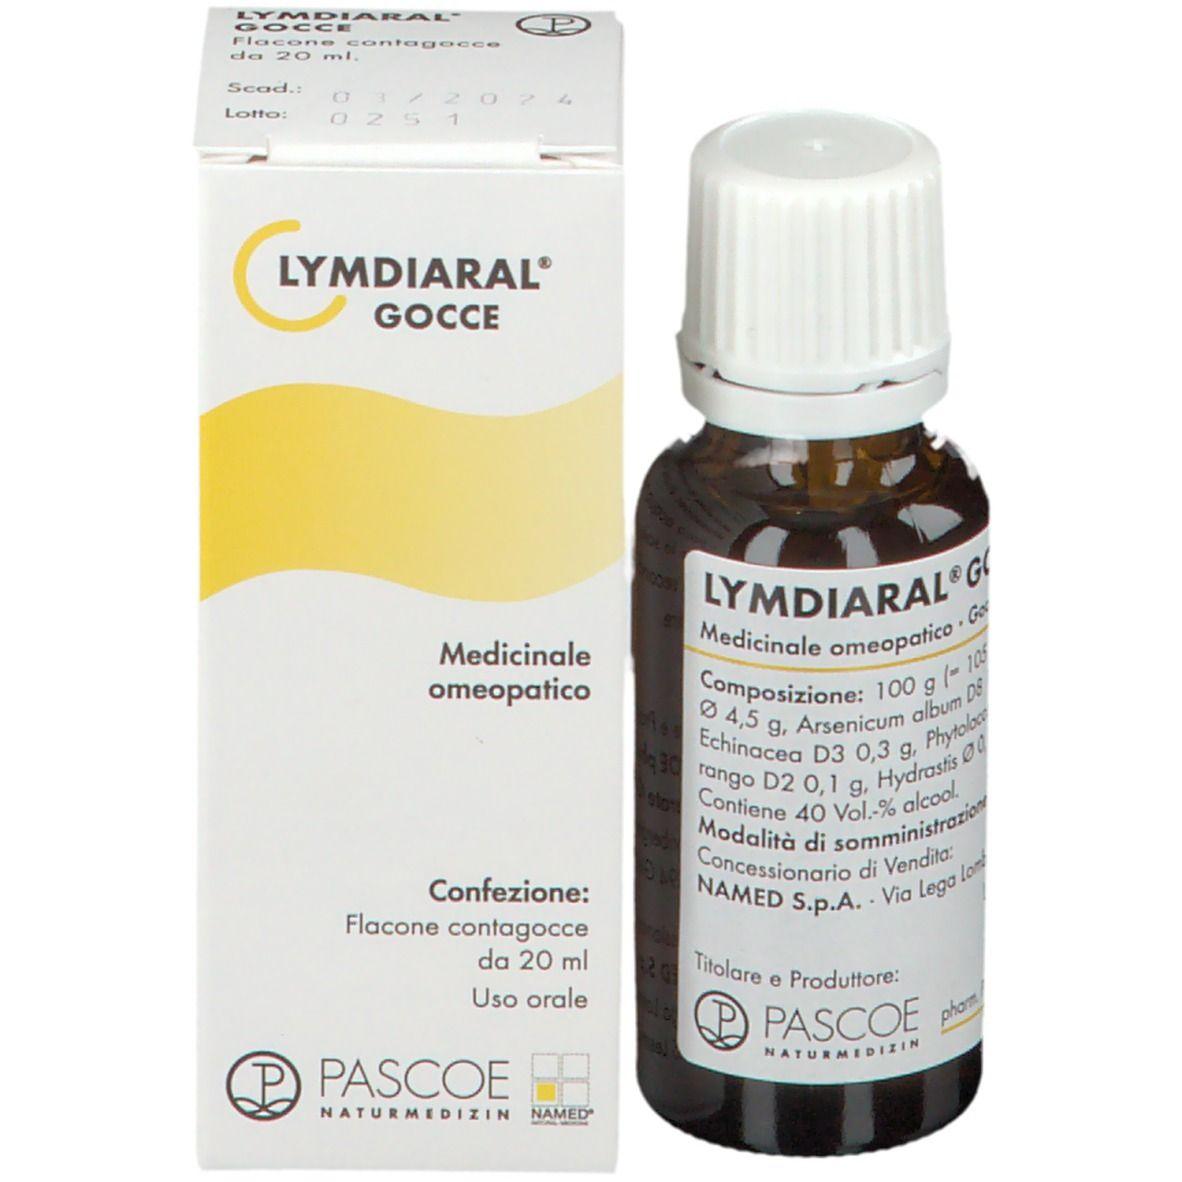 Lymdiaral Gocce 20 ml